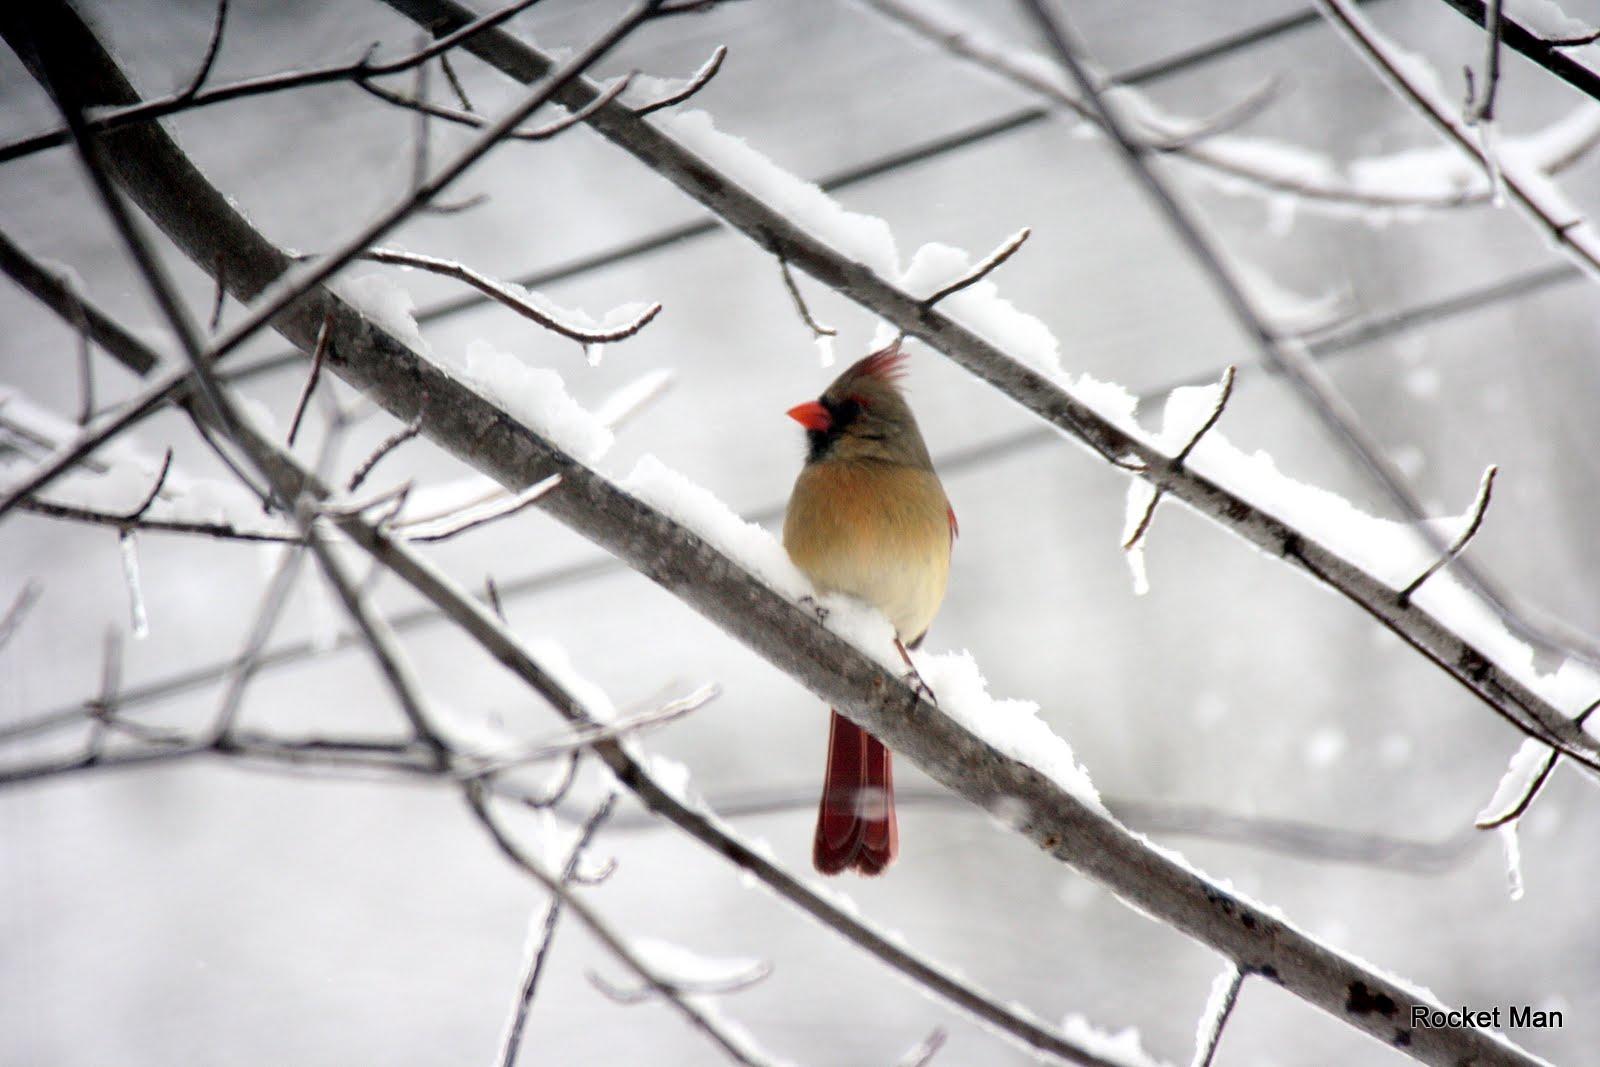 Slide Show Of Some Of My Bird Photos >> More Birds The Pine Ridge Philosopher